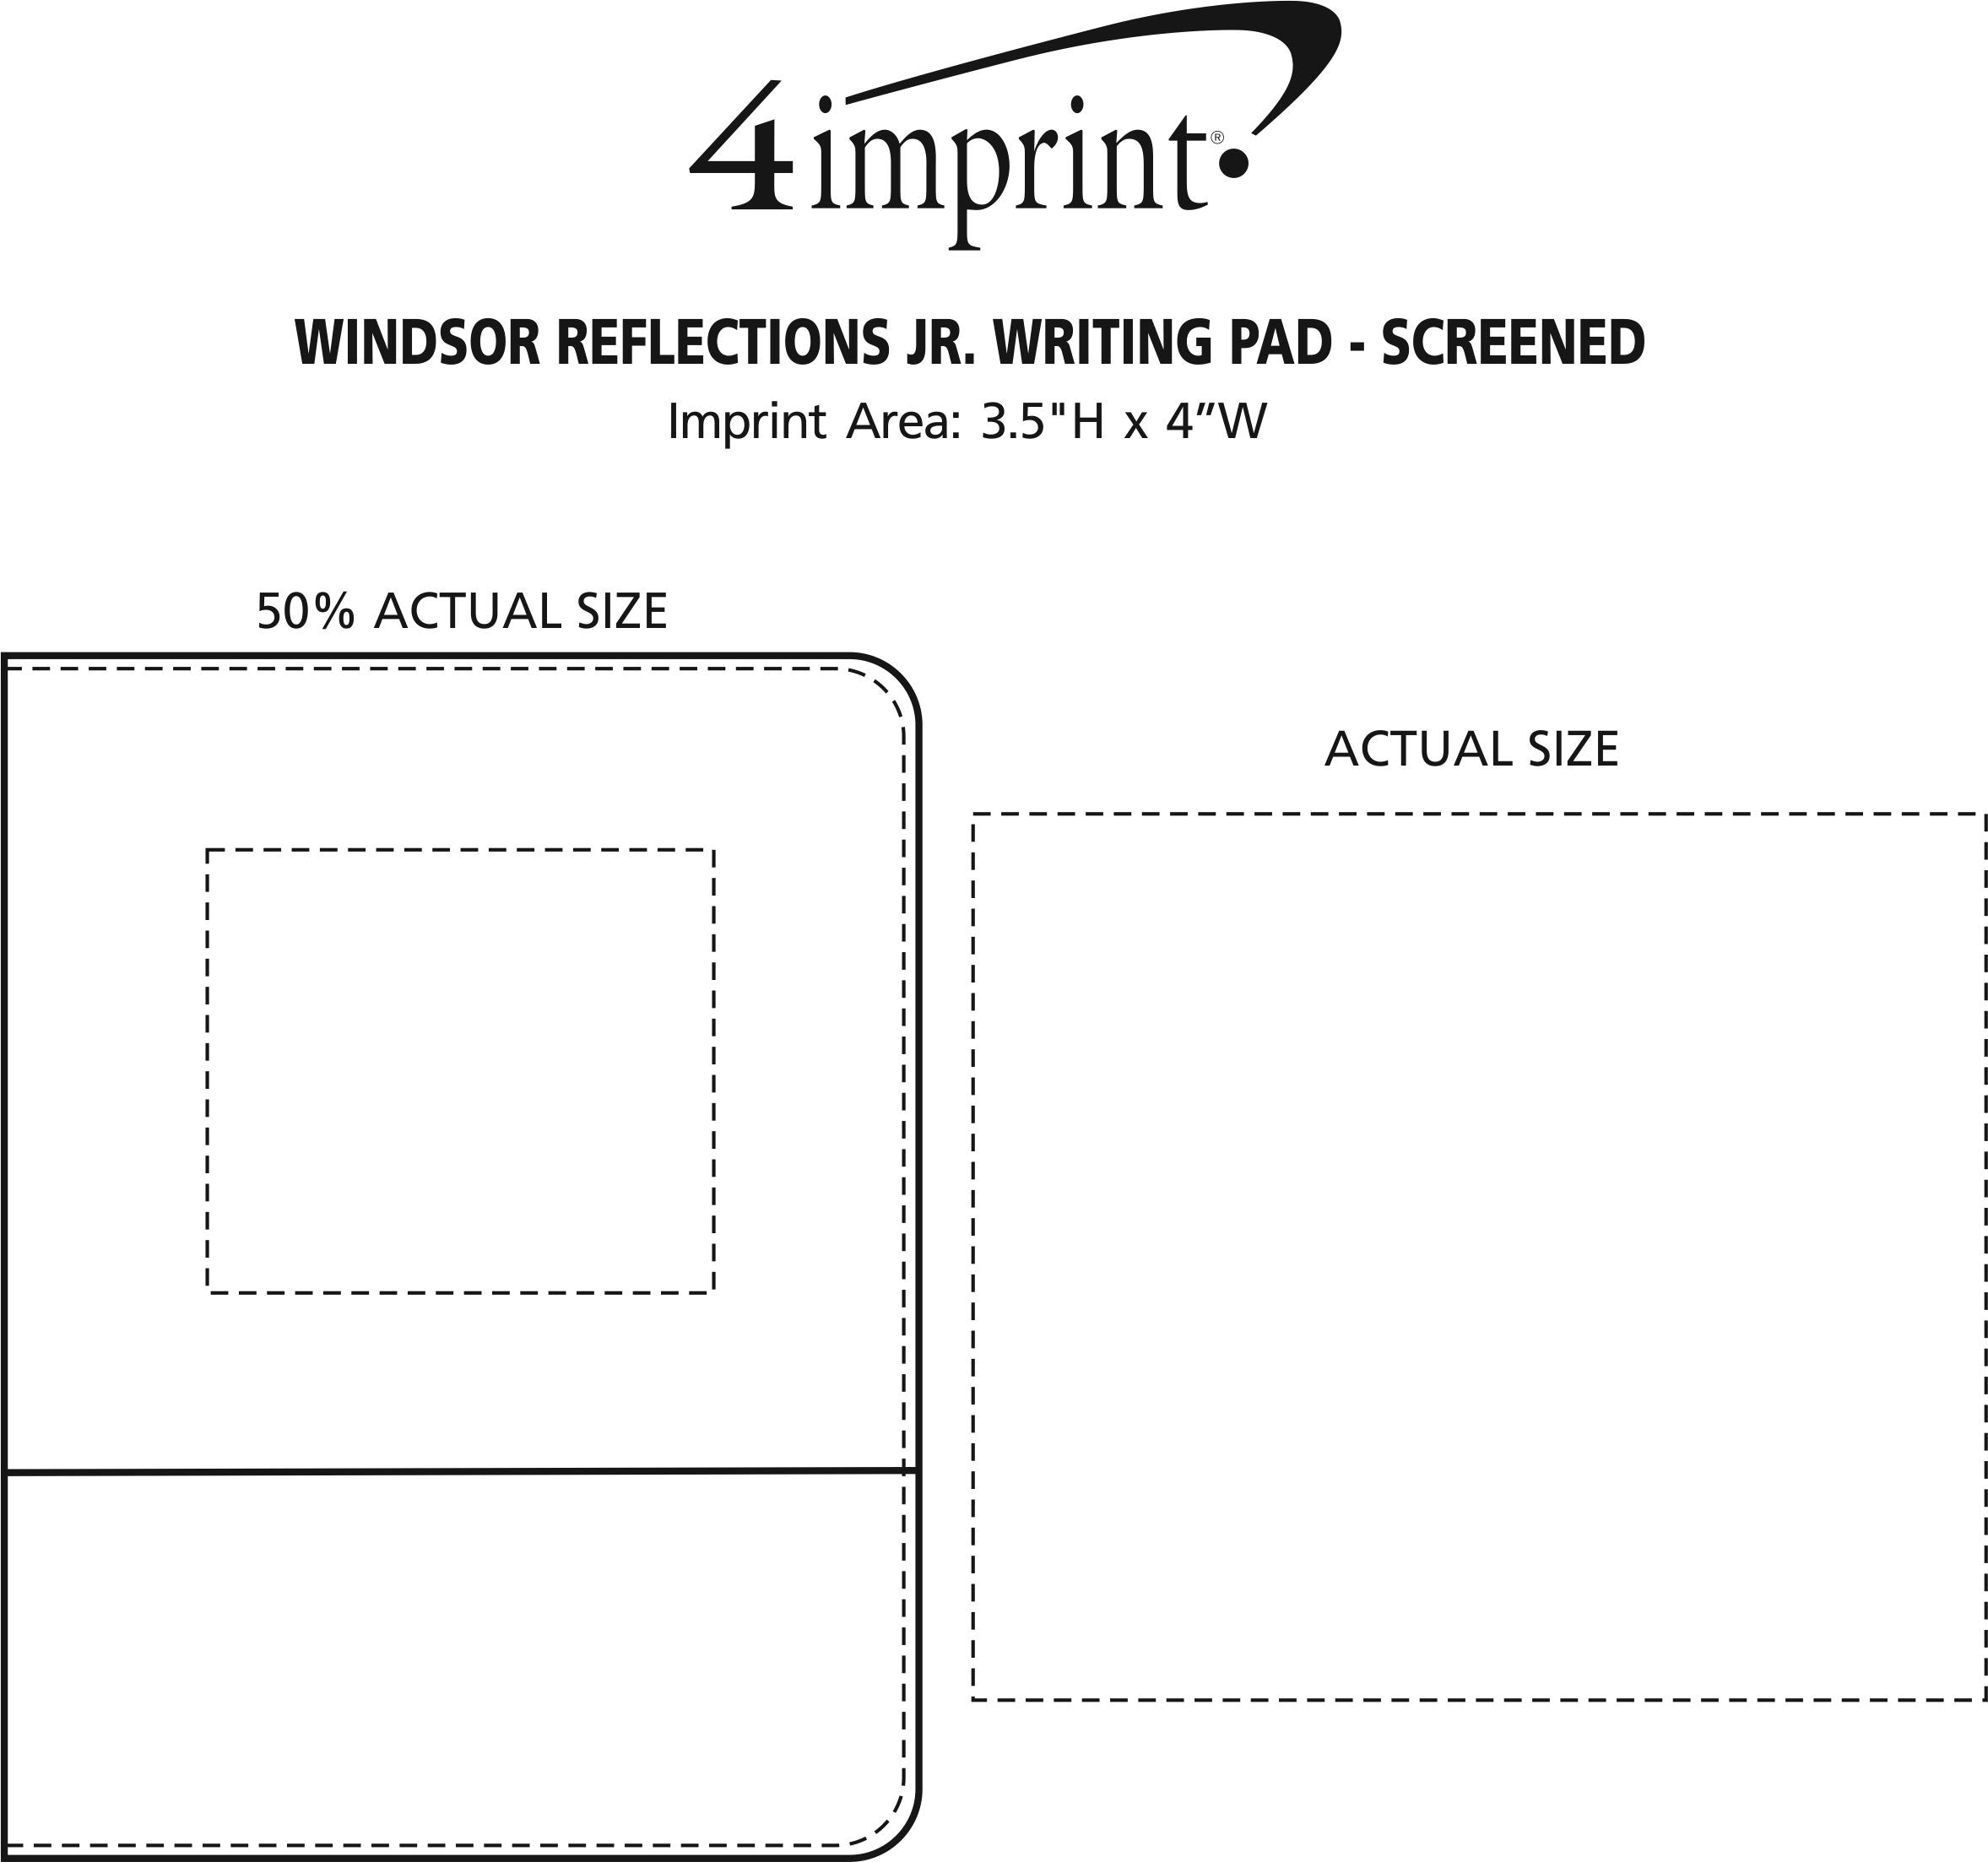 Imprint Area of Windsor Reflections Jr. Writing Pad